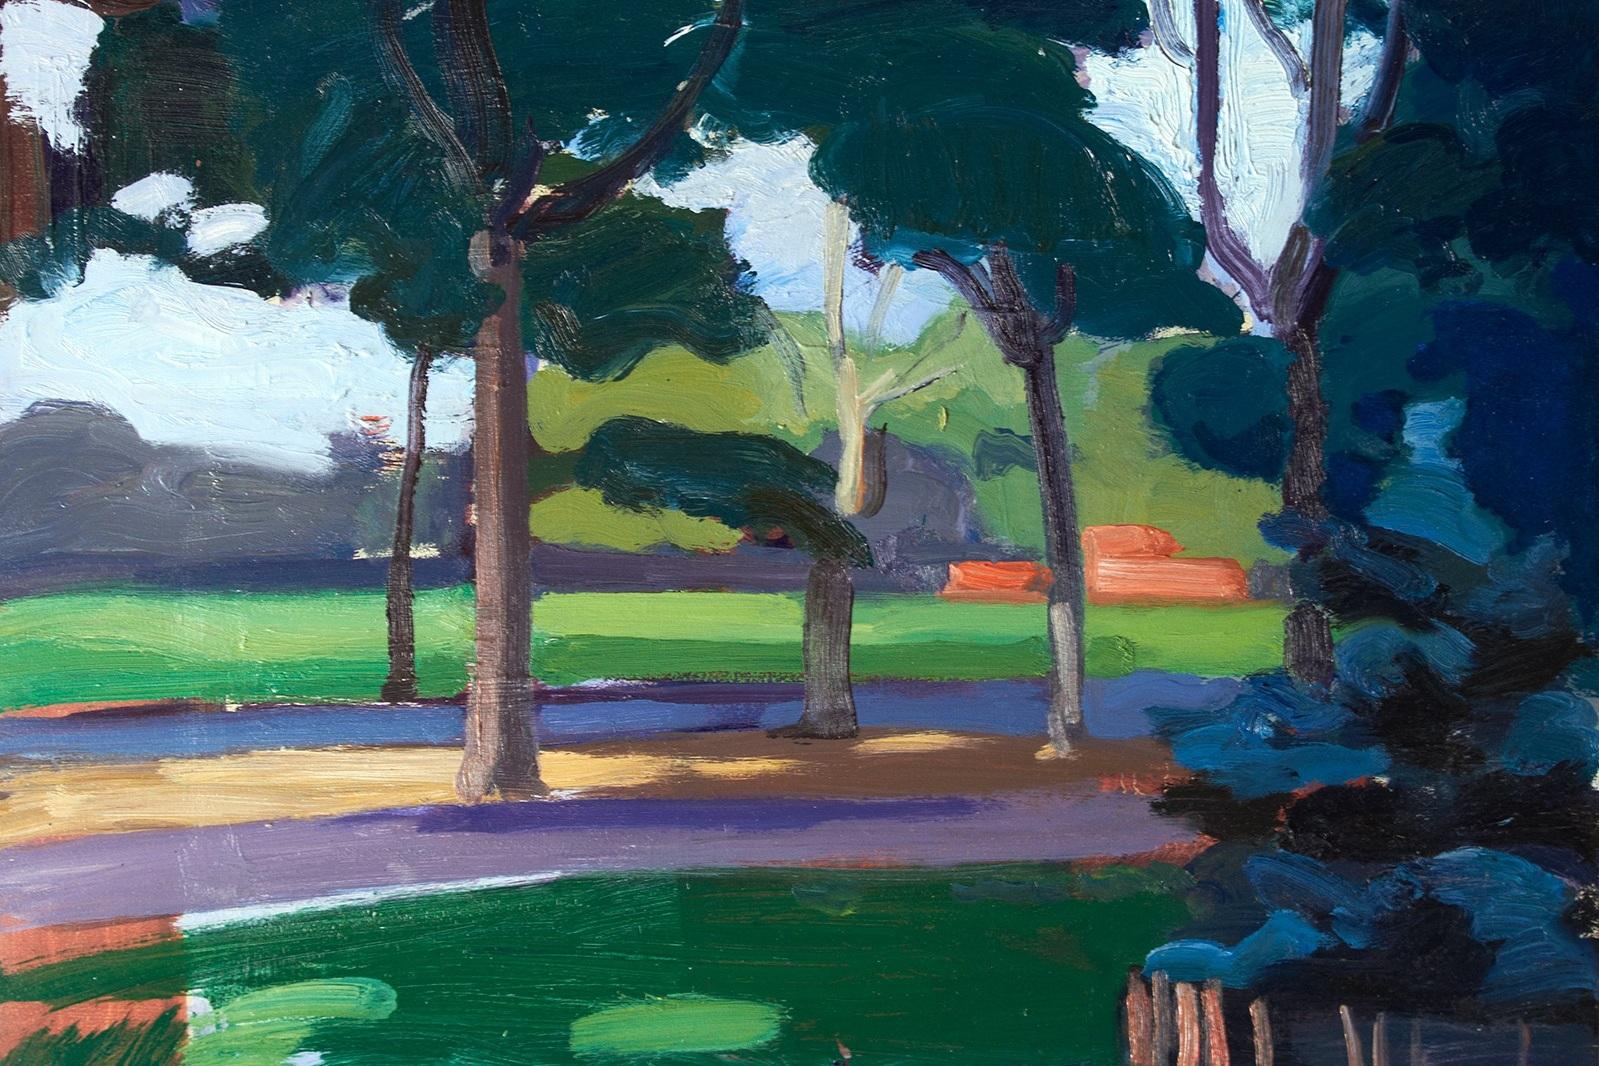 John Goodrich Painting the City